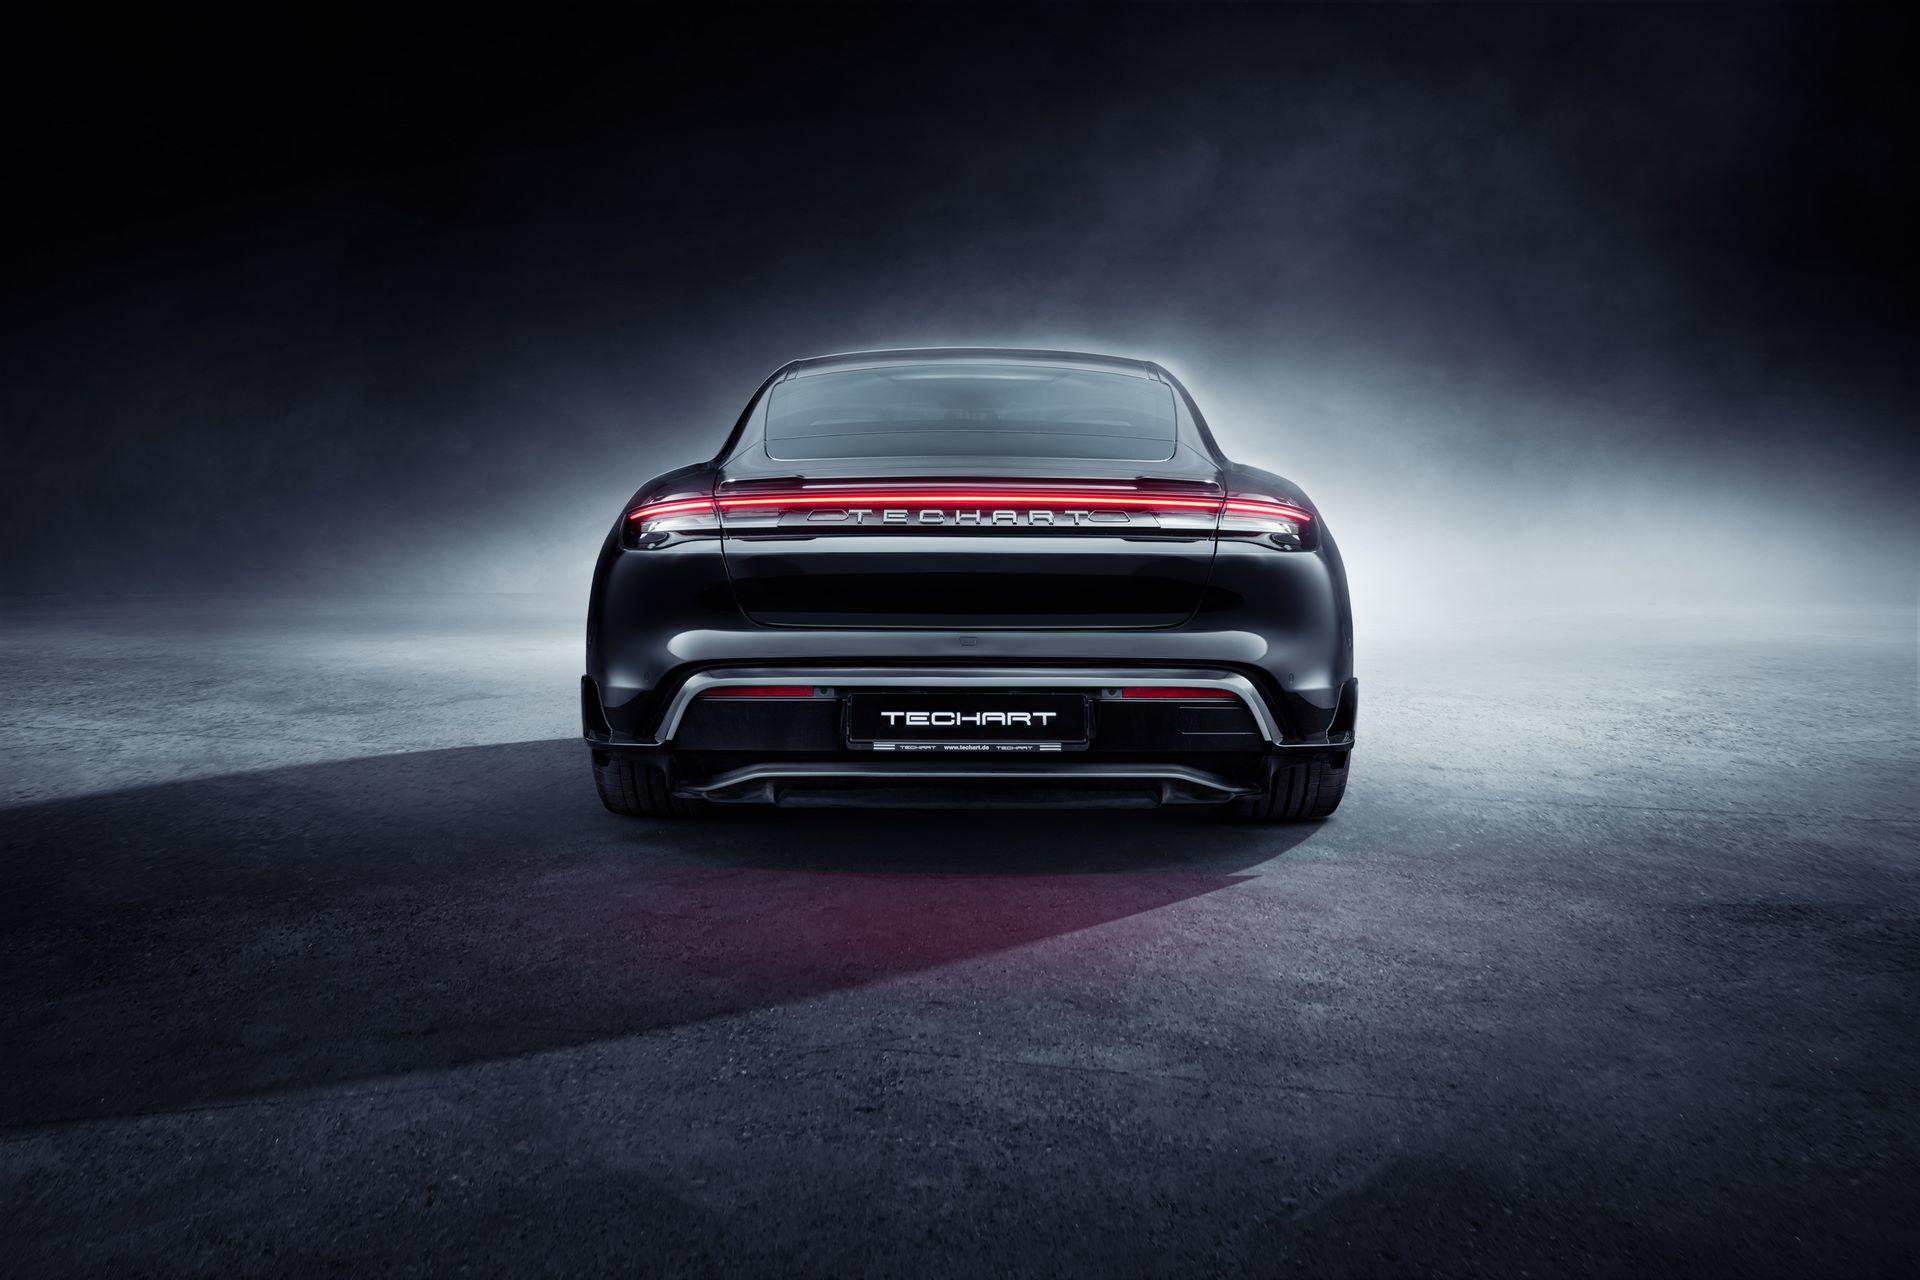 Porsche-Taycan-bodykit-by-TechArt-17